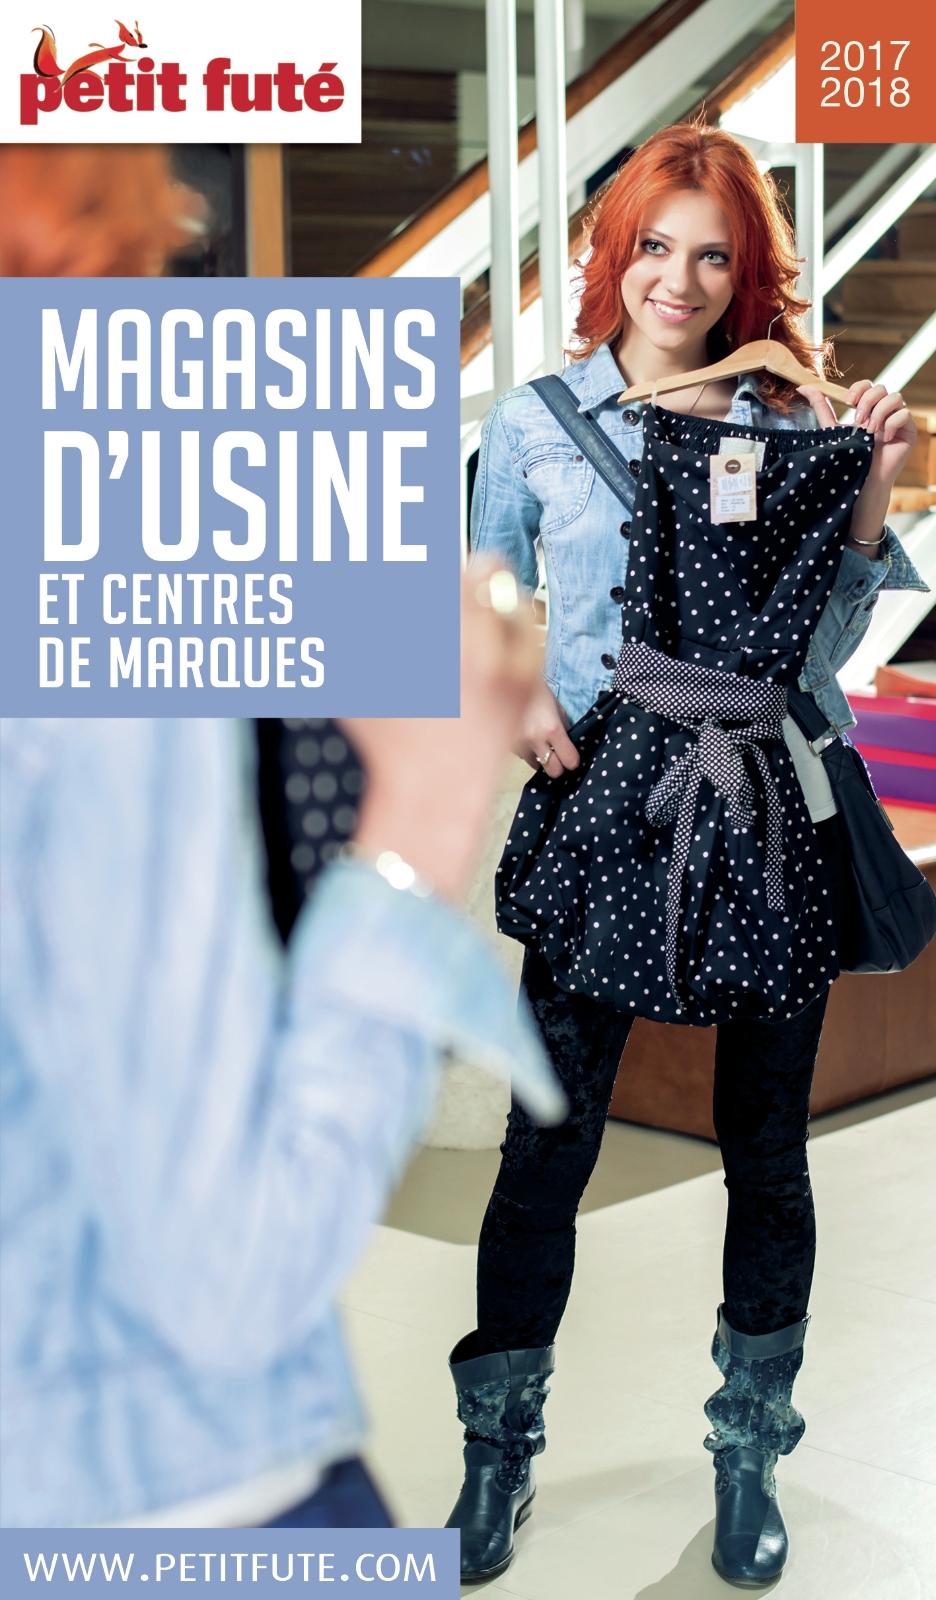 MAGASINS D'USINE 2017/2018 ...